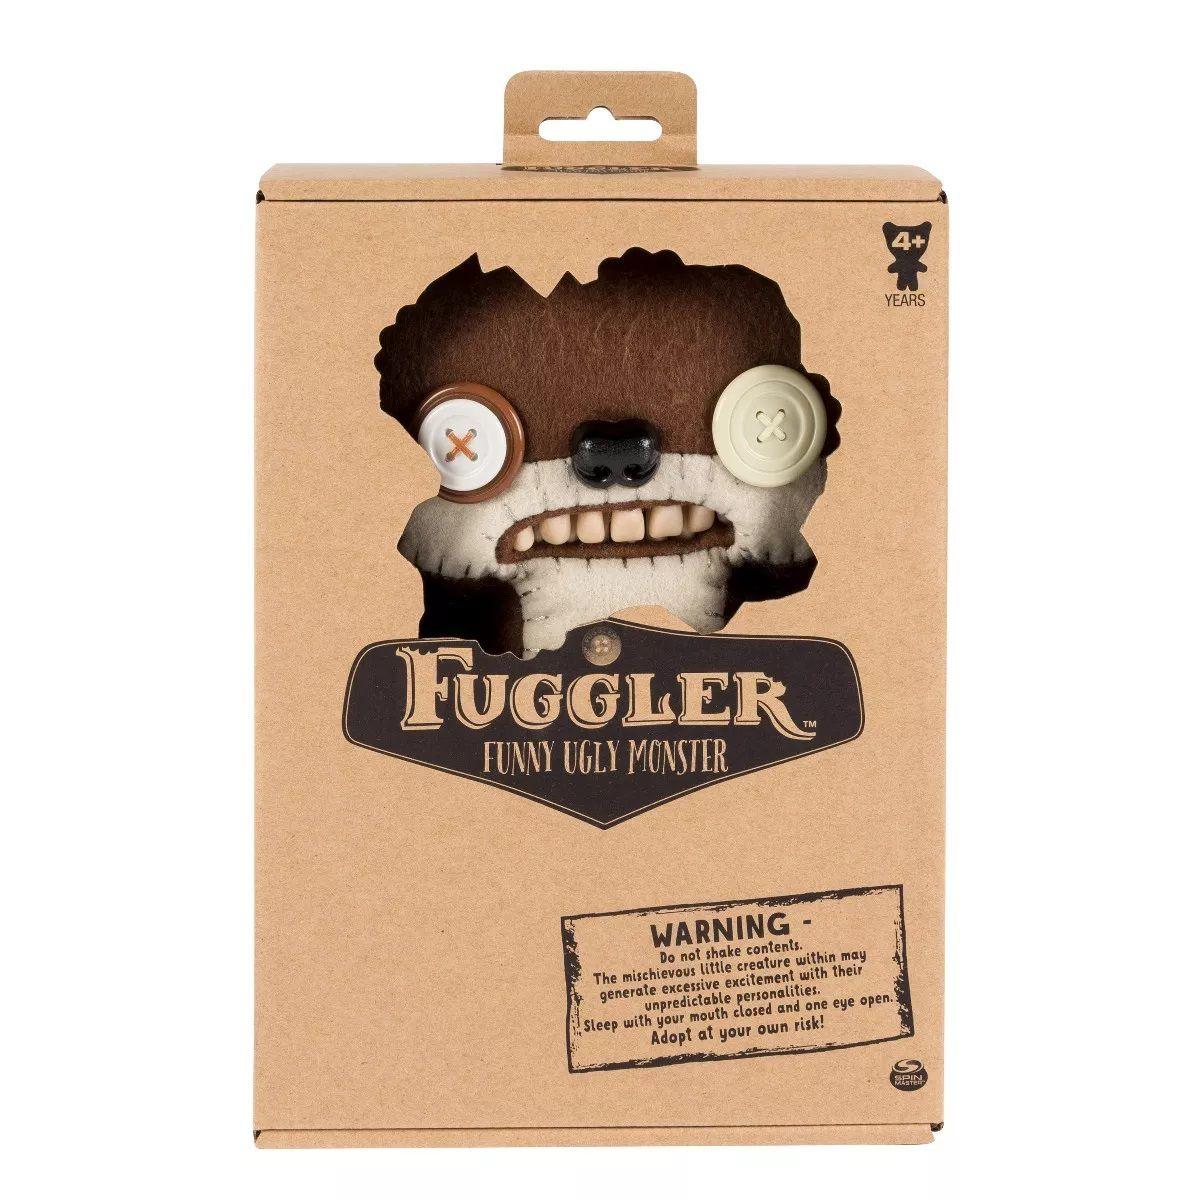 Pelúcia Monstruosa Marrom Média Fuggler Funny Ugly Monster 1915 Sunny